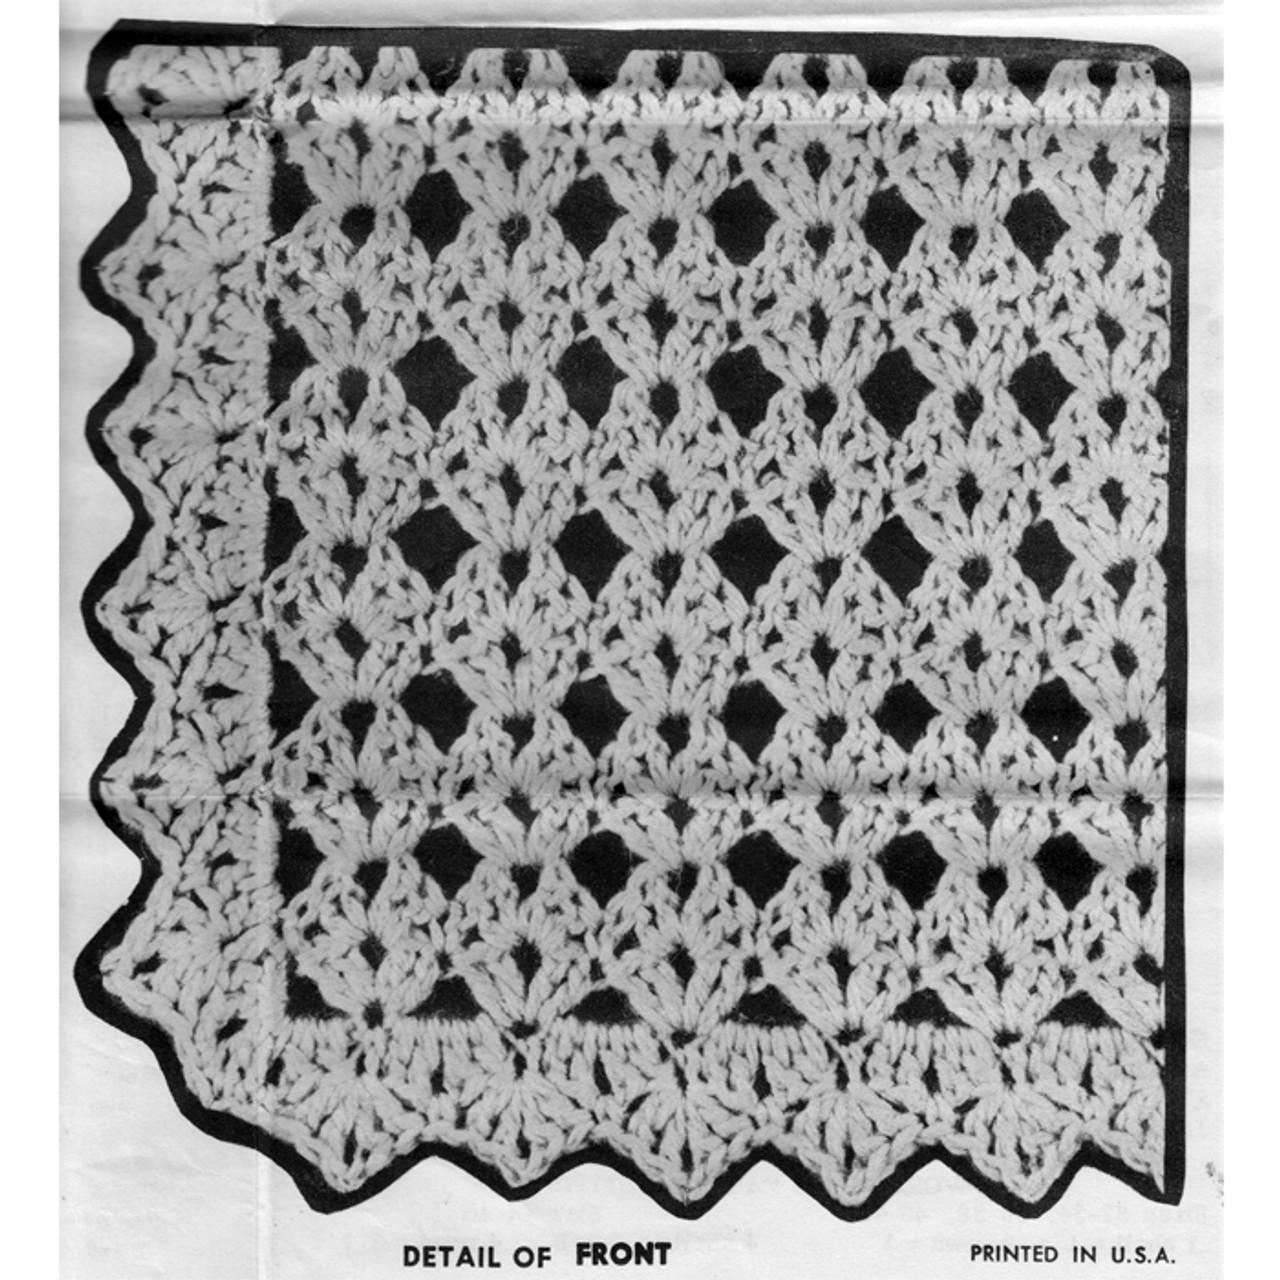 Shell Pattern Stitch Illustration for Vest